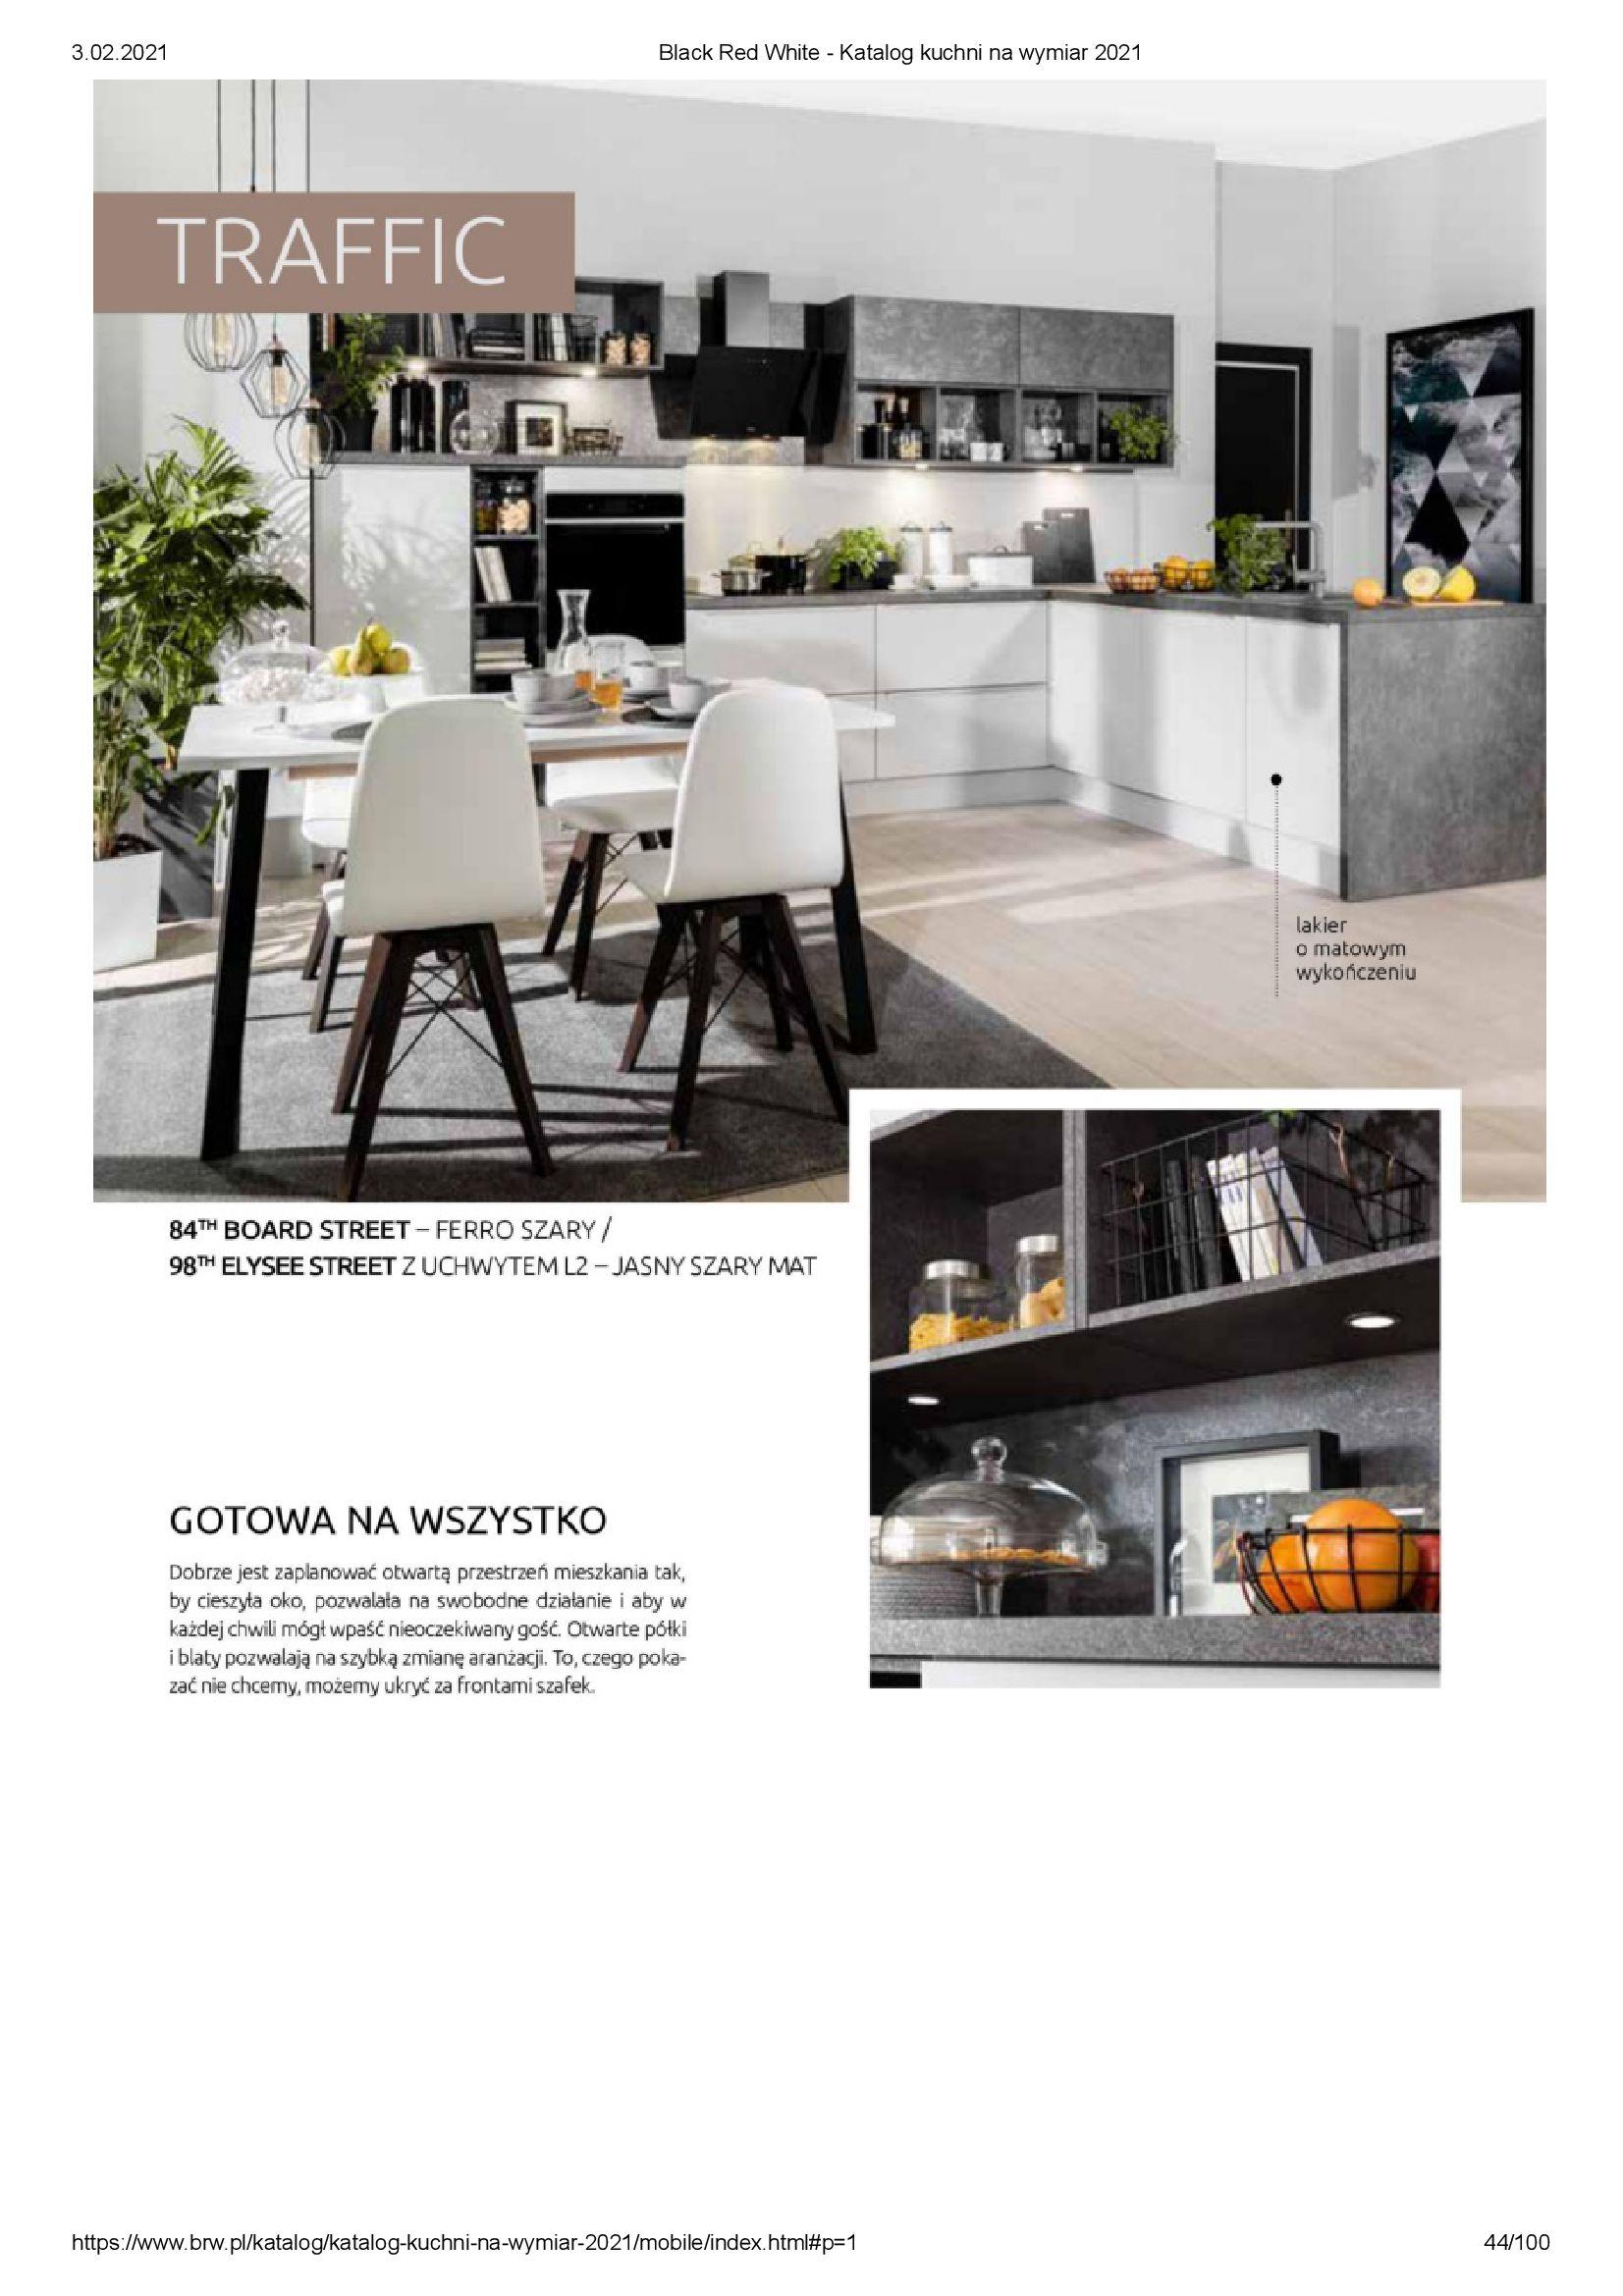 Gazetka Black Red White: Katalog - Kuchnie na wymiar Senso Kitchens 2021 2021-01-01 page-44